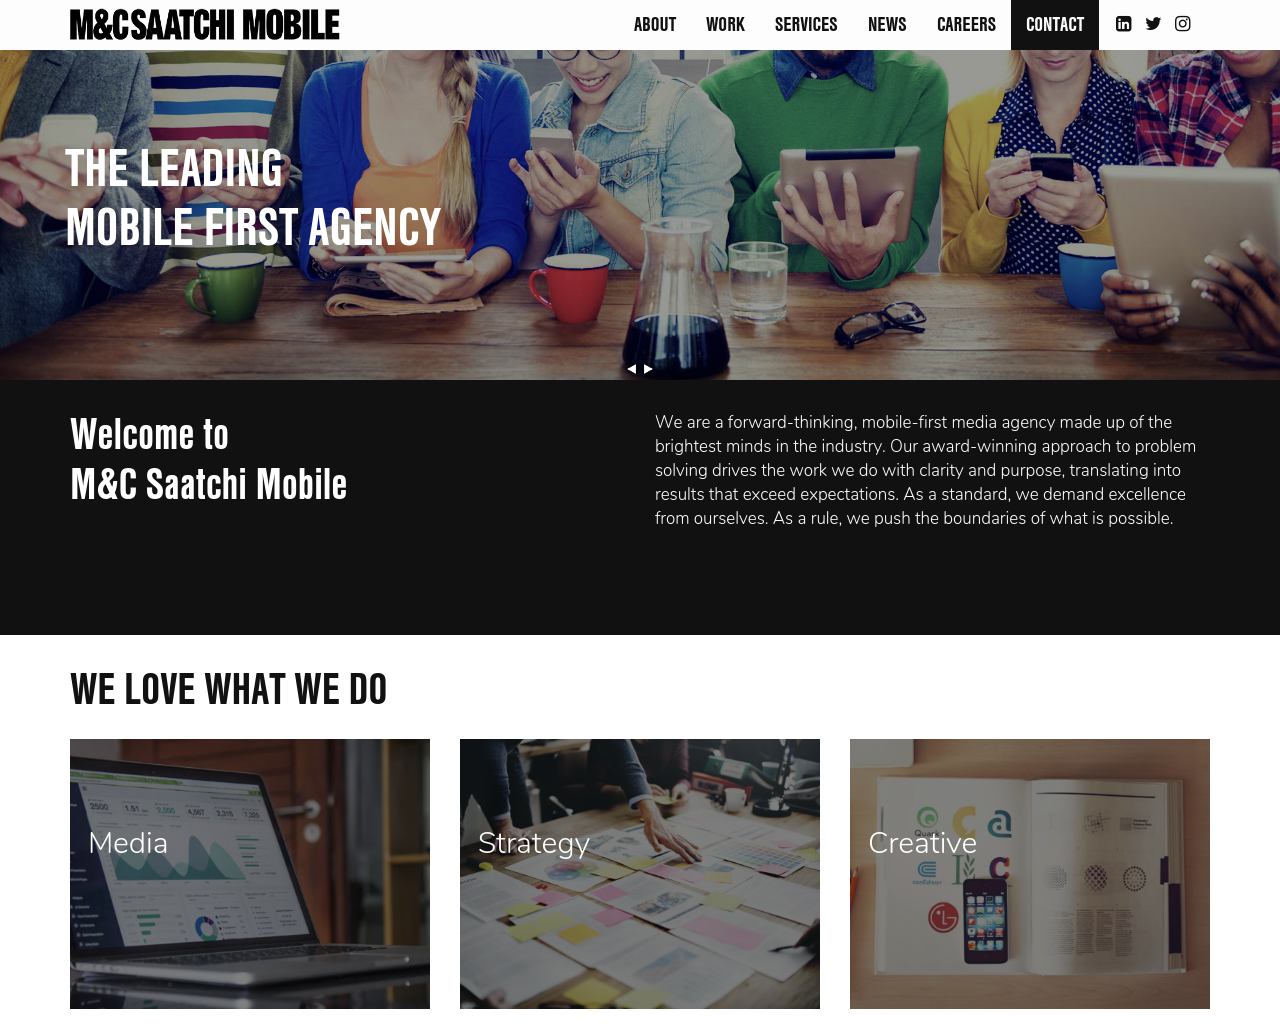 M&C-Saatchi-Mobile-Advertising-Reviews-Pricing